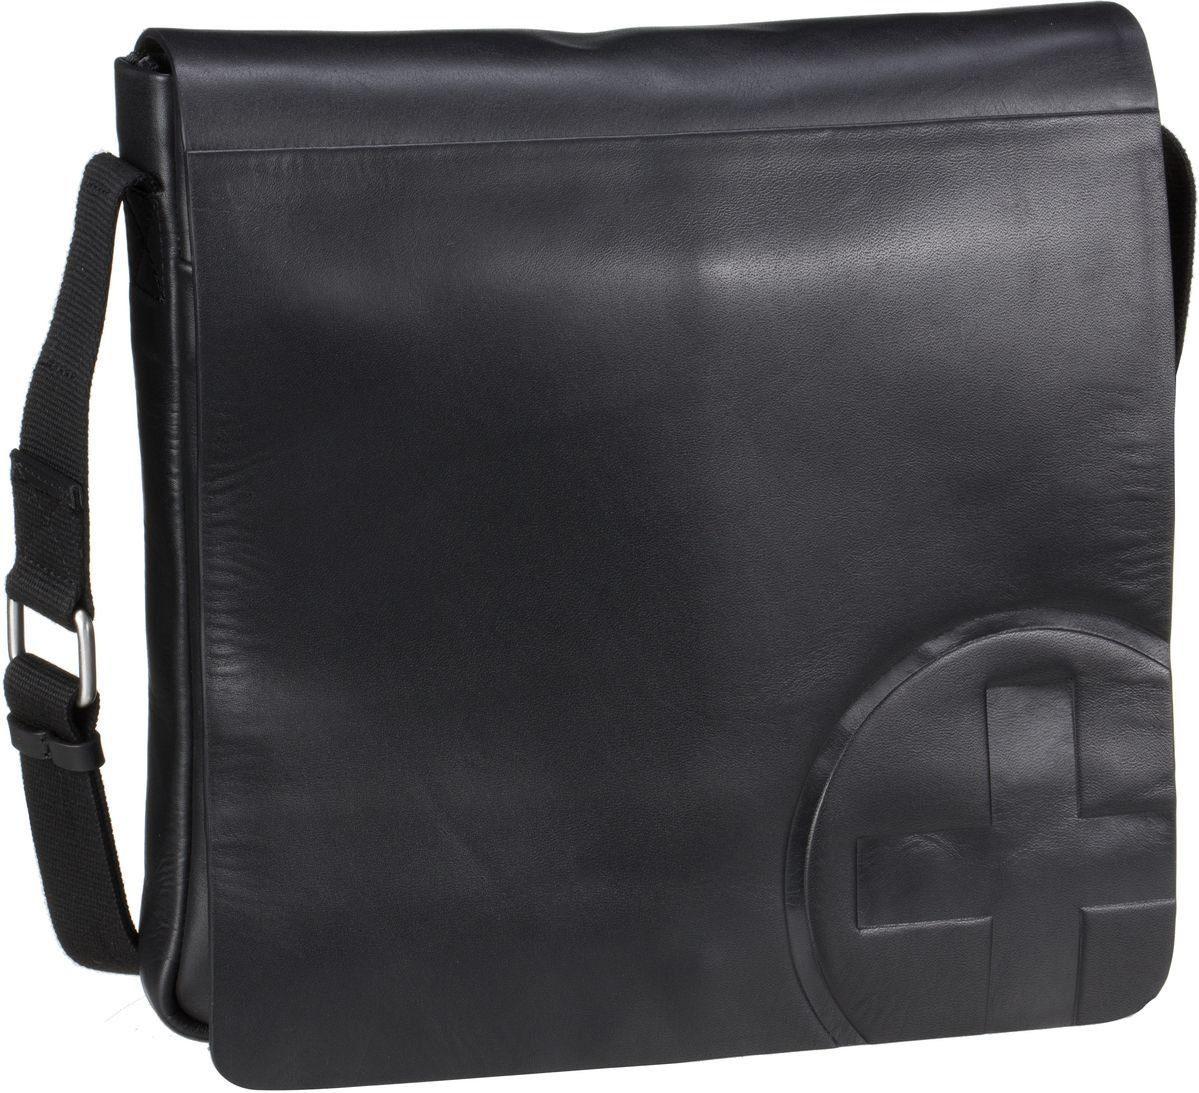 Strellson Notebooktasche / Tablet »Jones Shoulderbag SVF«